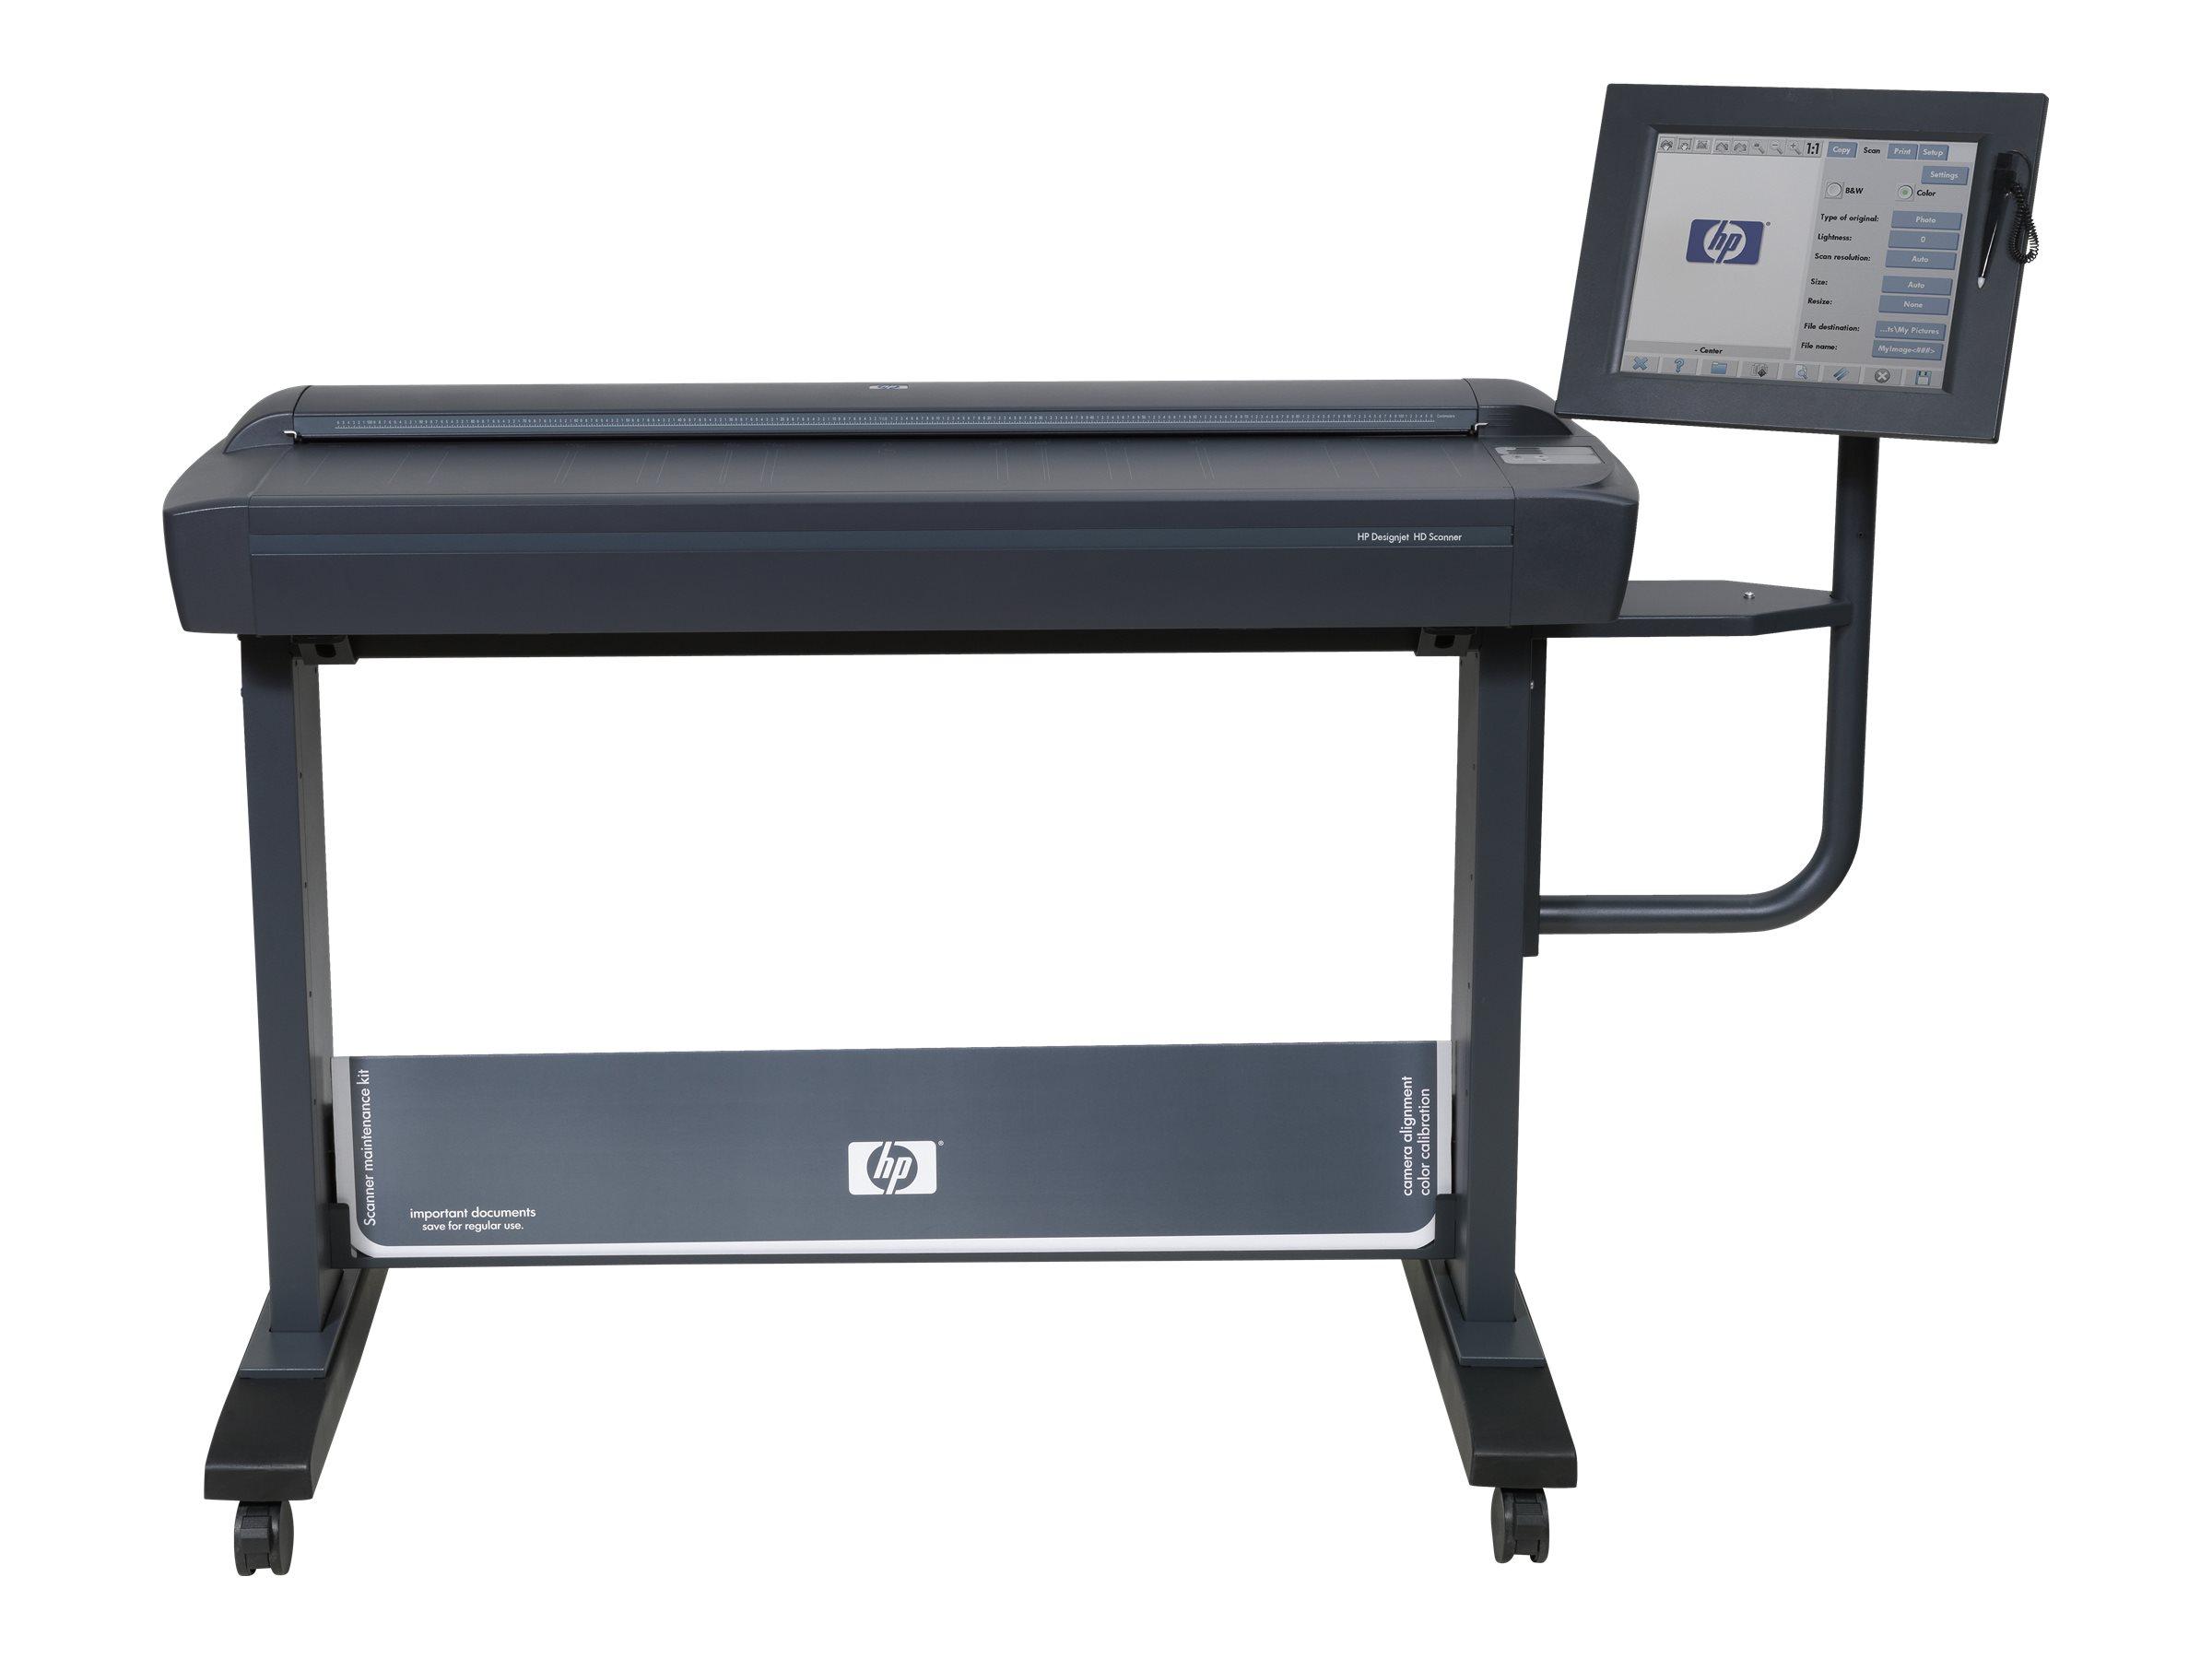 HP Designjet HD Scanner - Rollen-Scanner - Rolle 106,7 cm - 600 dpi x 600 dpi - USB, Gigabit LAN